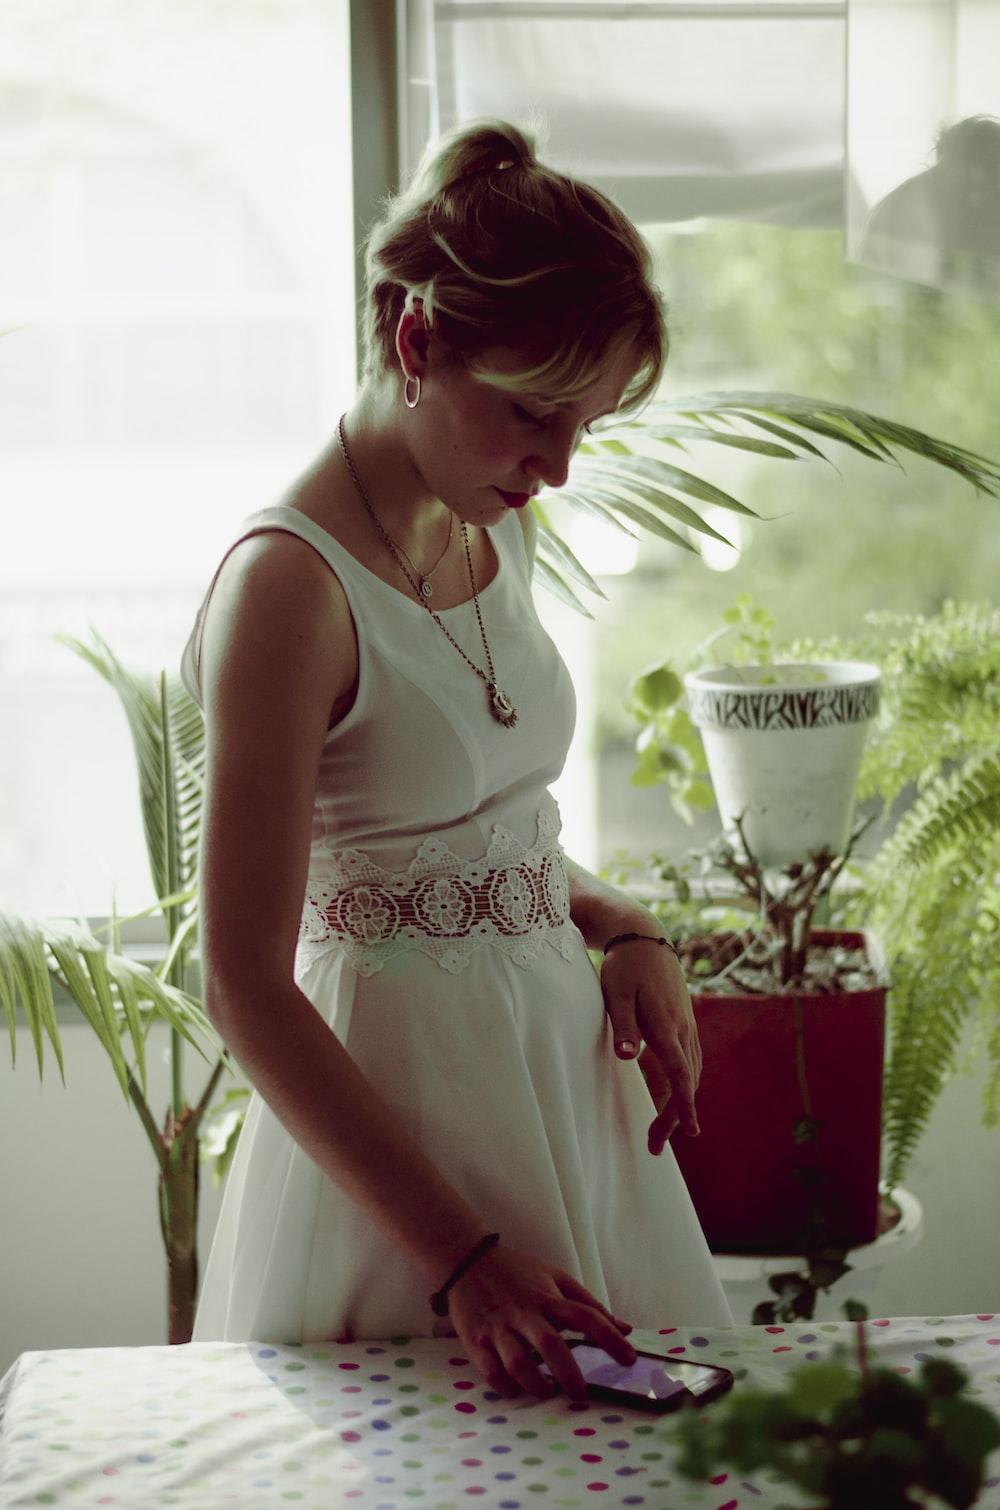 women's white sleeveless dress using smartphone on table